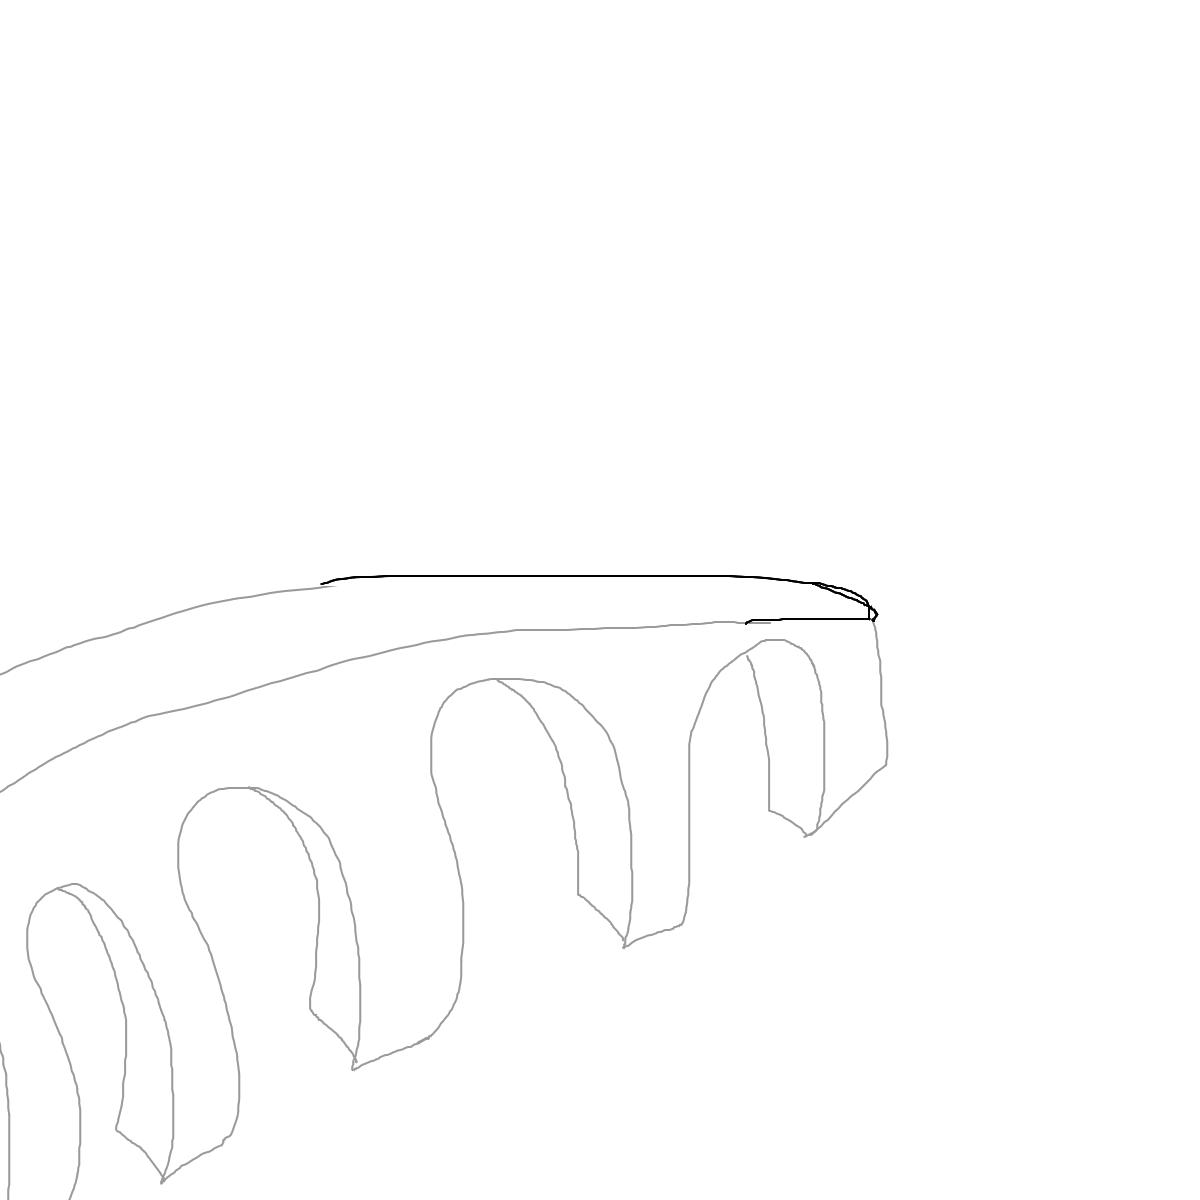 BAAAM drawing#746 lat:40.9635124206543000lng: -4.0978608131408690